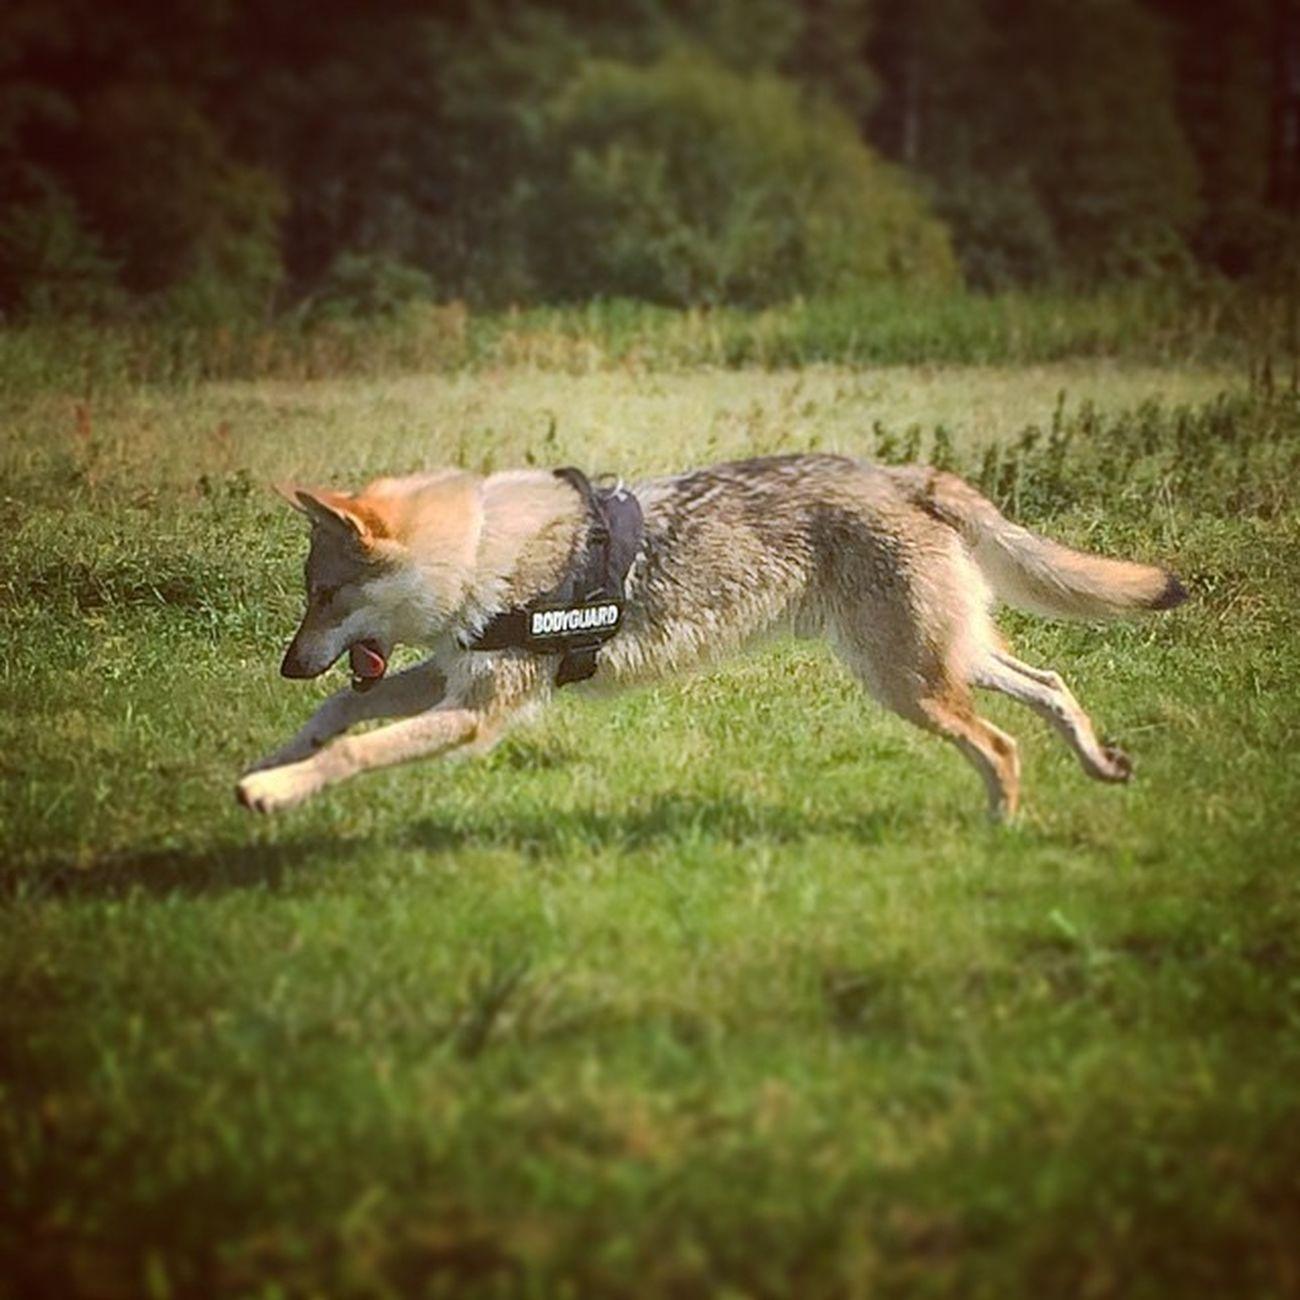 ??? Bodygourd Juliusk9 Wolfdog Czechwolfdog wolf dog vlcak lupo lupi loup czechoslovakianwolfdog direwolf wilczak wilkor czechoslowackiwilczak czechosłowackiwilczak vlciak wolfstagram petstagram instadog instawolf hybryd hybrid funnydog dogphotography tesoridicarli wilk ilovemydog love puppylove